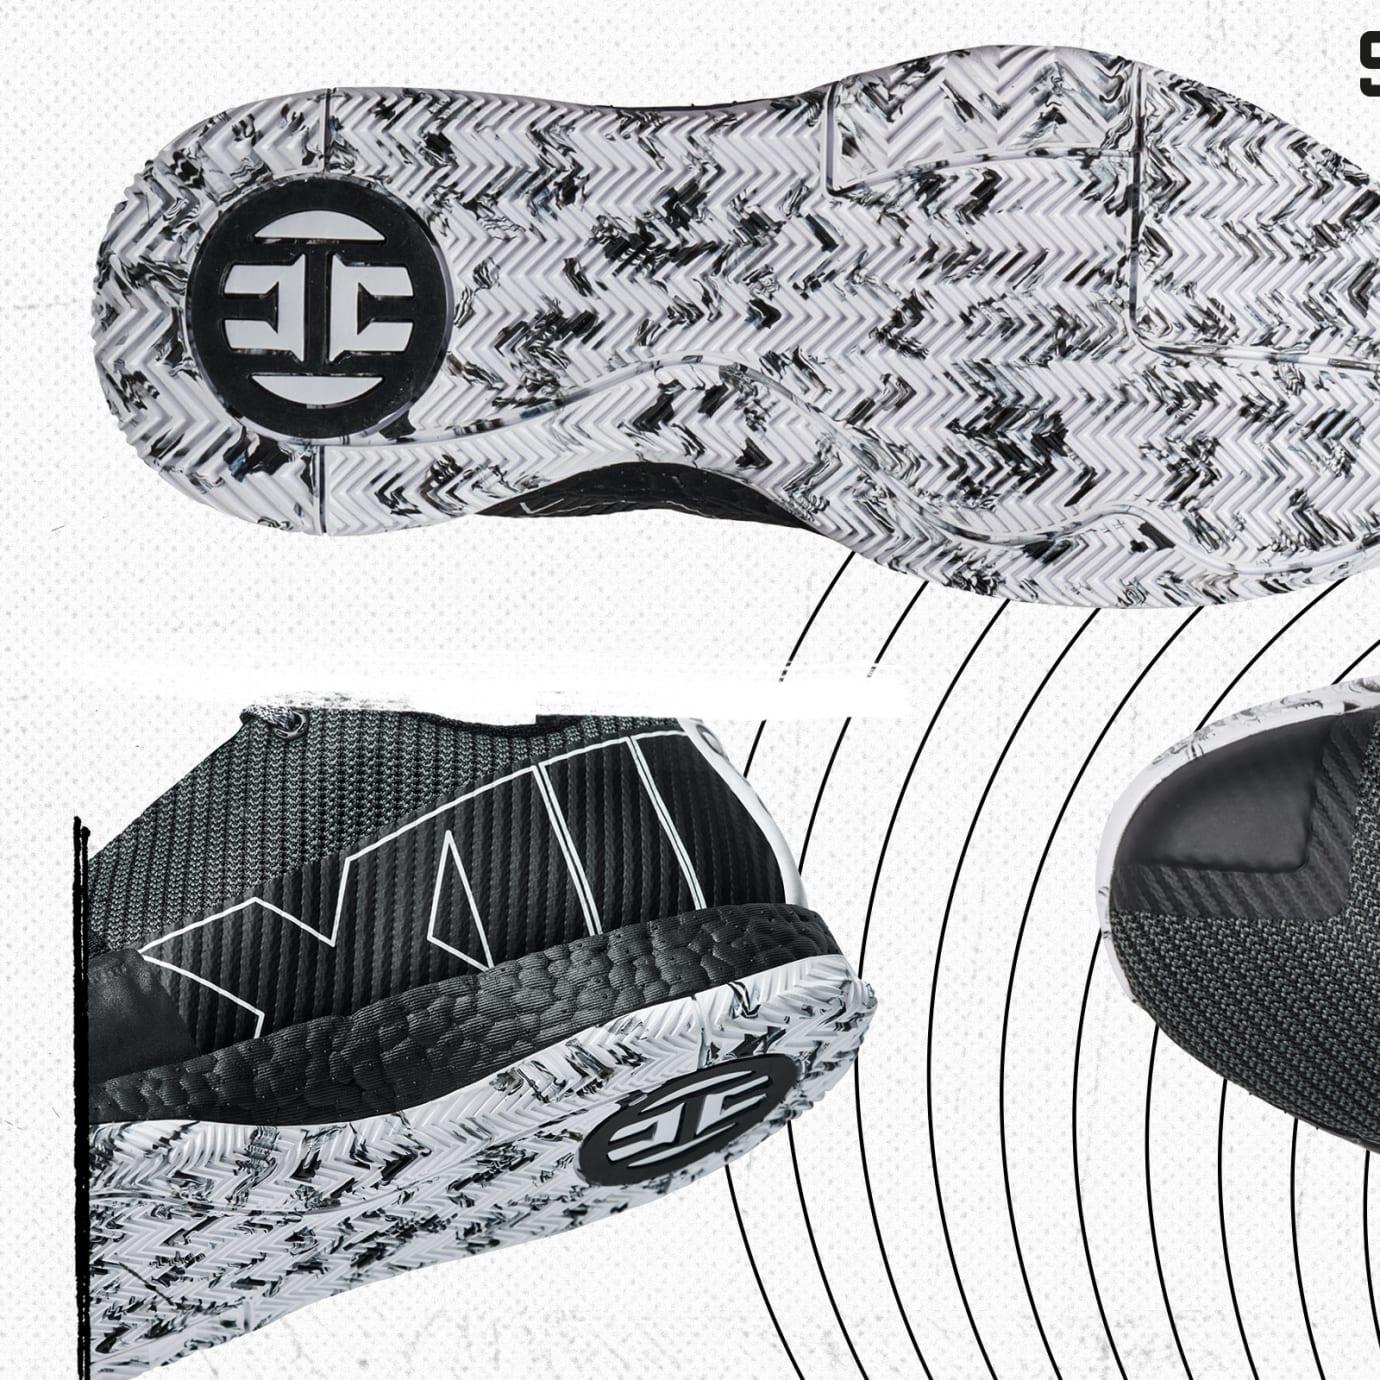 e6d21eabb31d Adidas Harden Vol. 3 Release Date Rashad Williams Interview